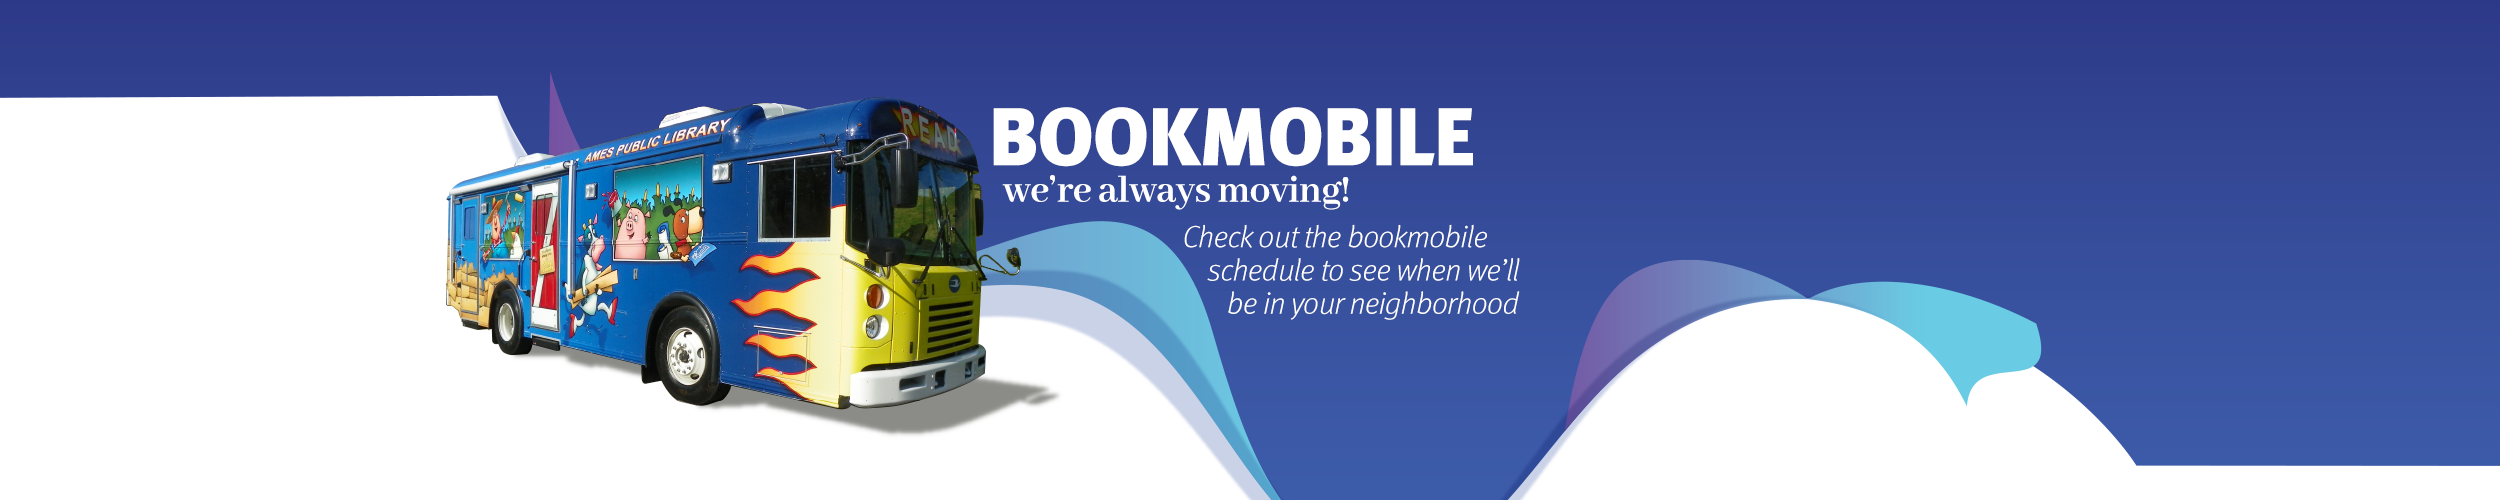 Bookmobile Schedule Slide